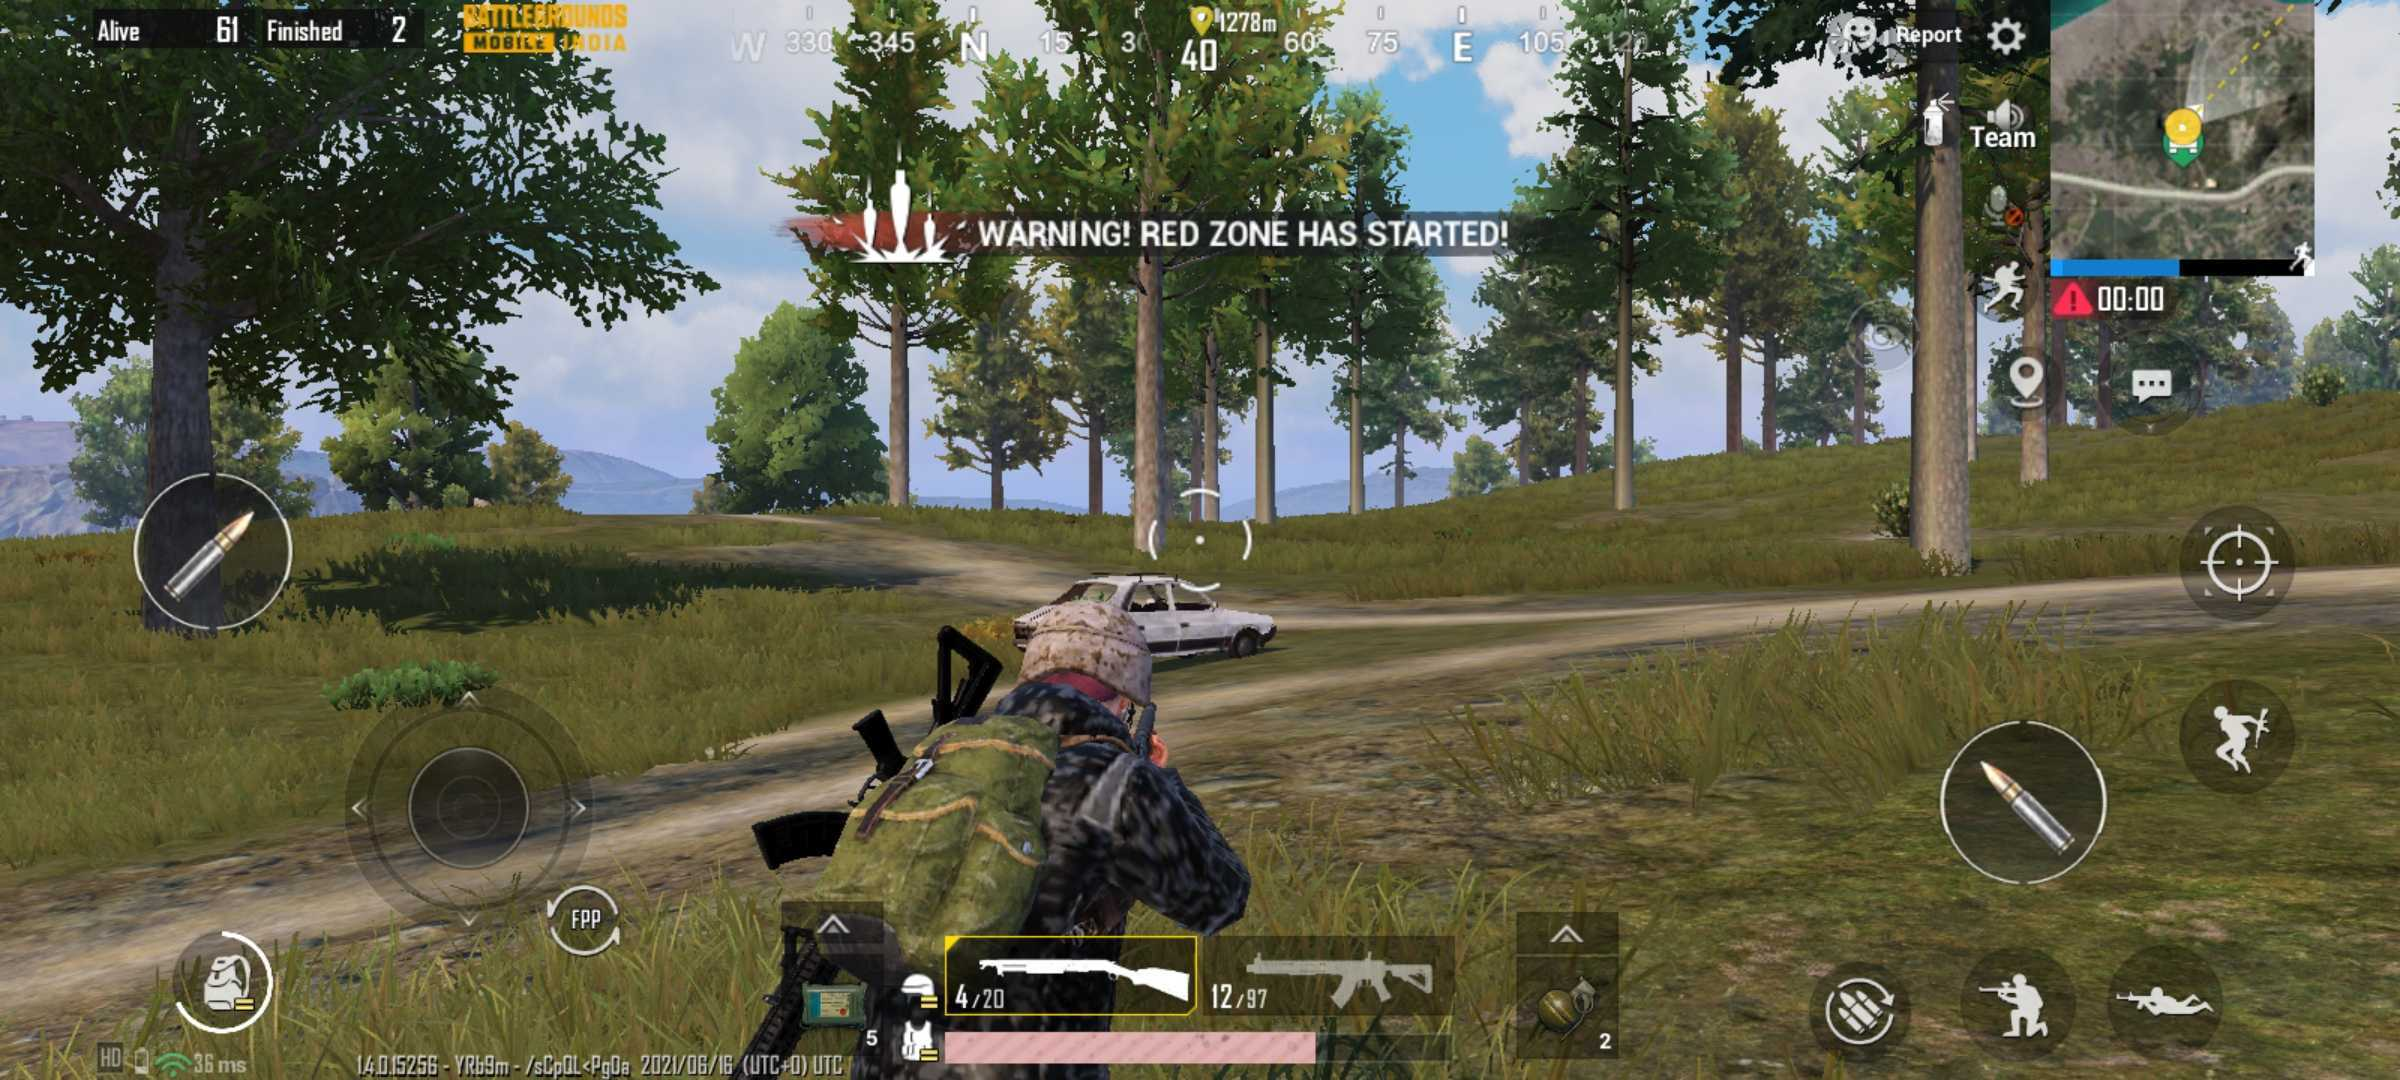 Battlegrounds Mobile India (BGMI) Screenshot